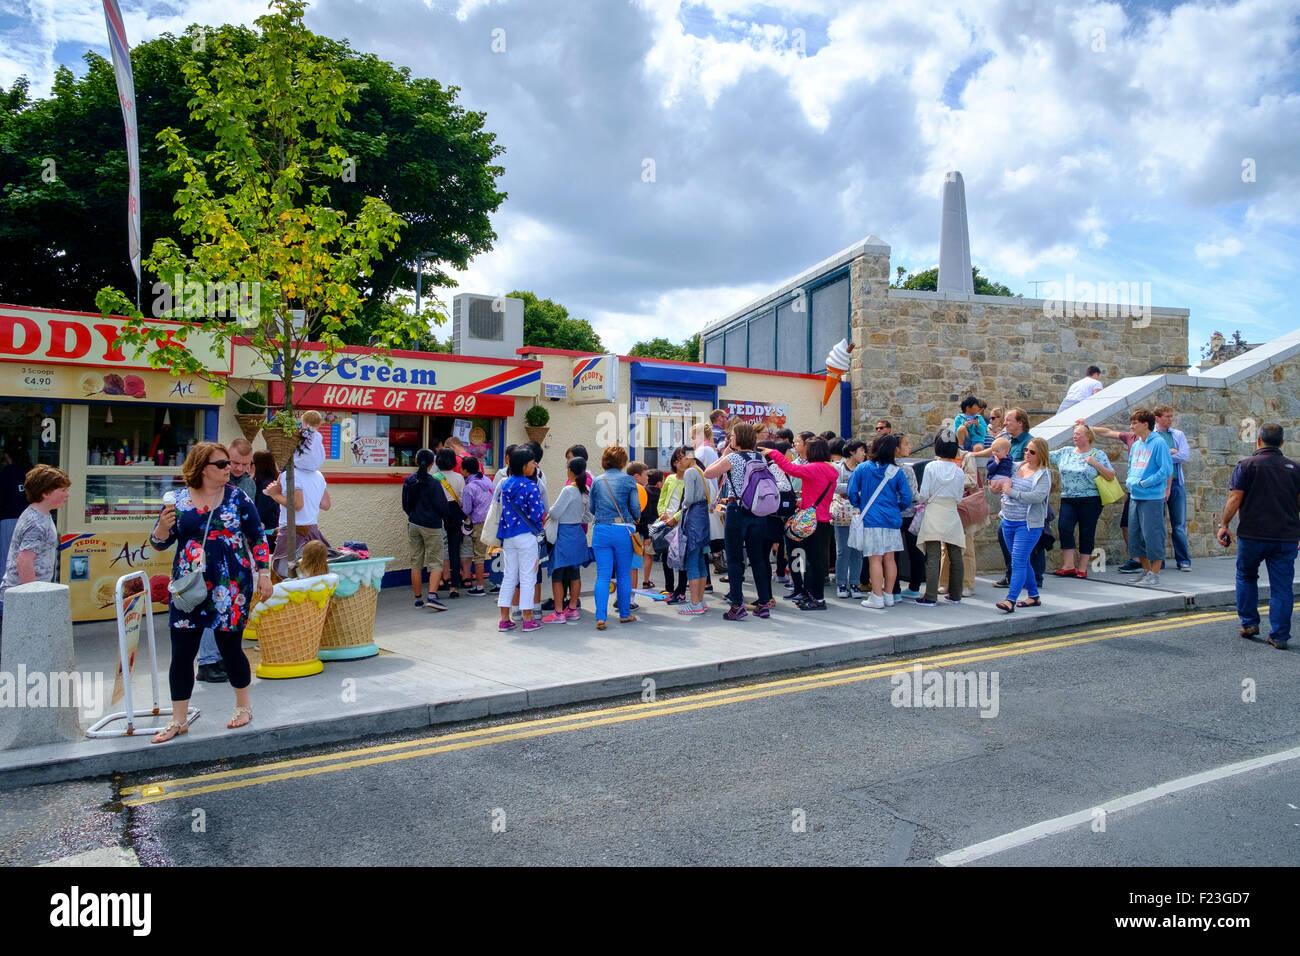 queue people teddy's teddys ice cream shop ireland - Stock Image